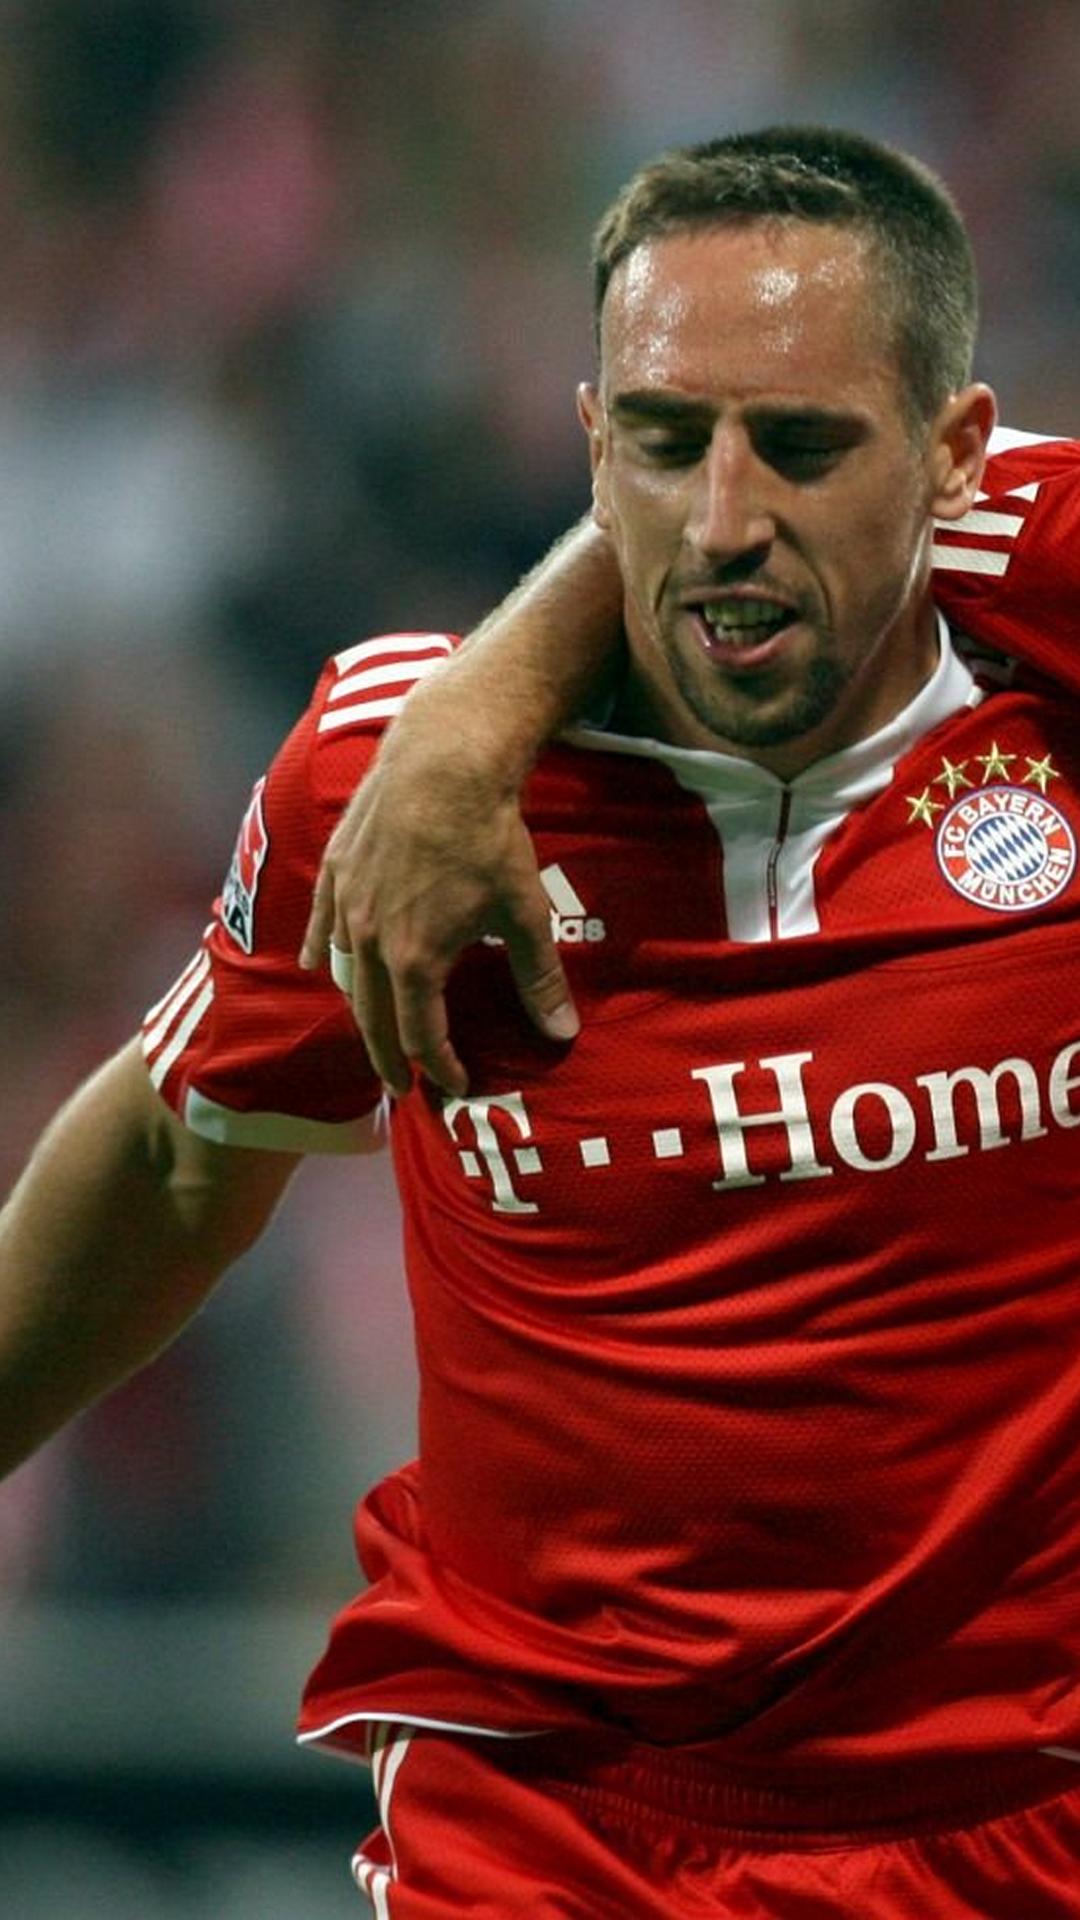 FC Bayern Munich, Franck Ribery, Football, Soccer, fondos galaxy s4, fondos de pantalla galaxy s4, sfondi samsung galaxy s4, hintergrund, ????, full size 1080x1920